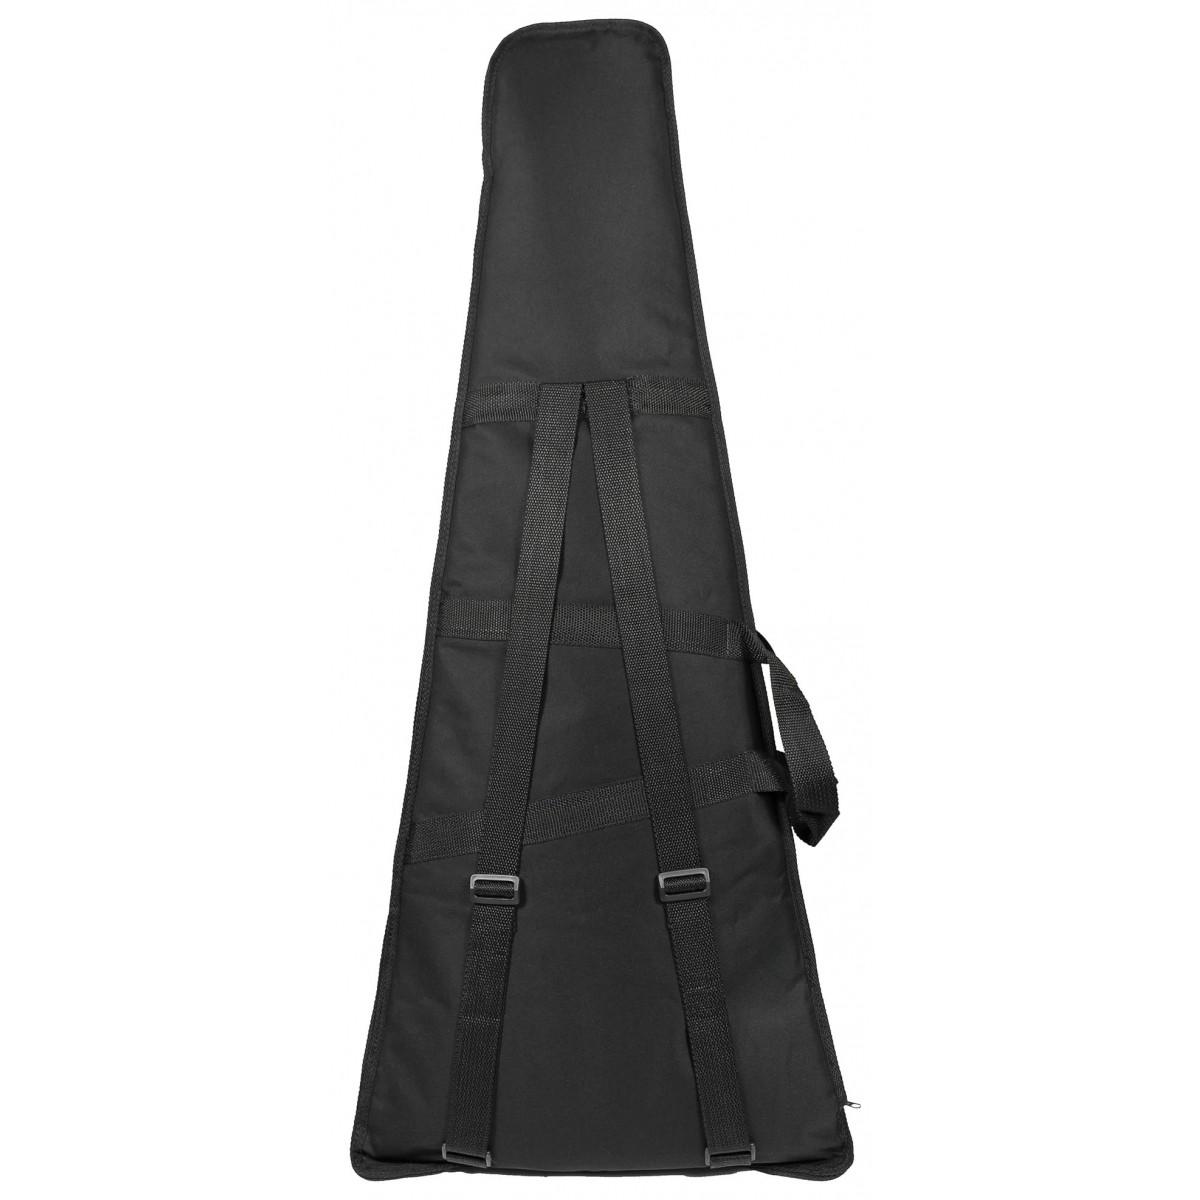 Capa Guitarra Soft Case Start Almofadada - Cinza